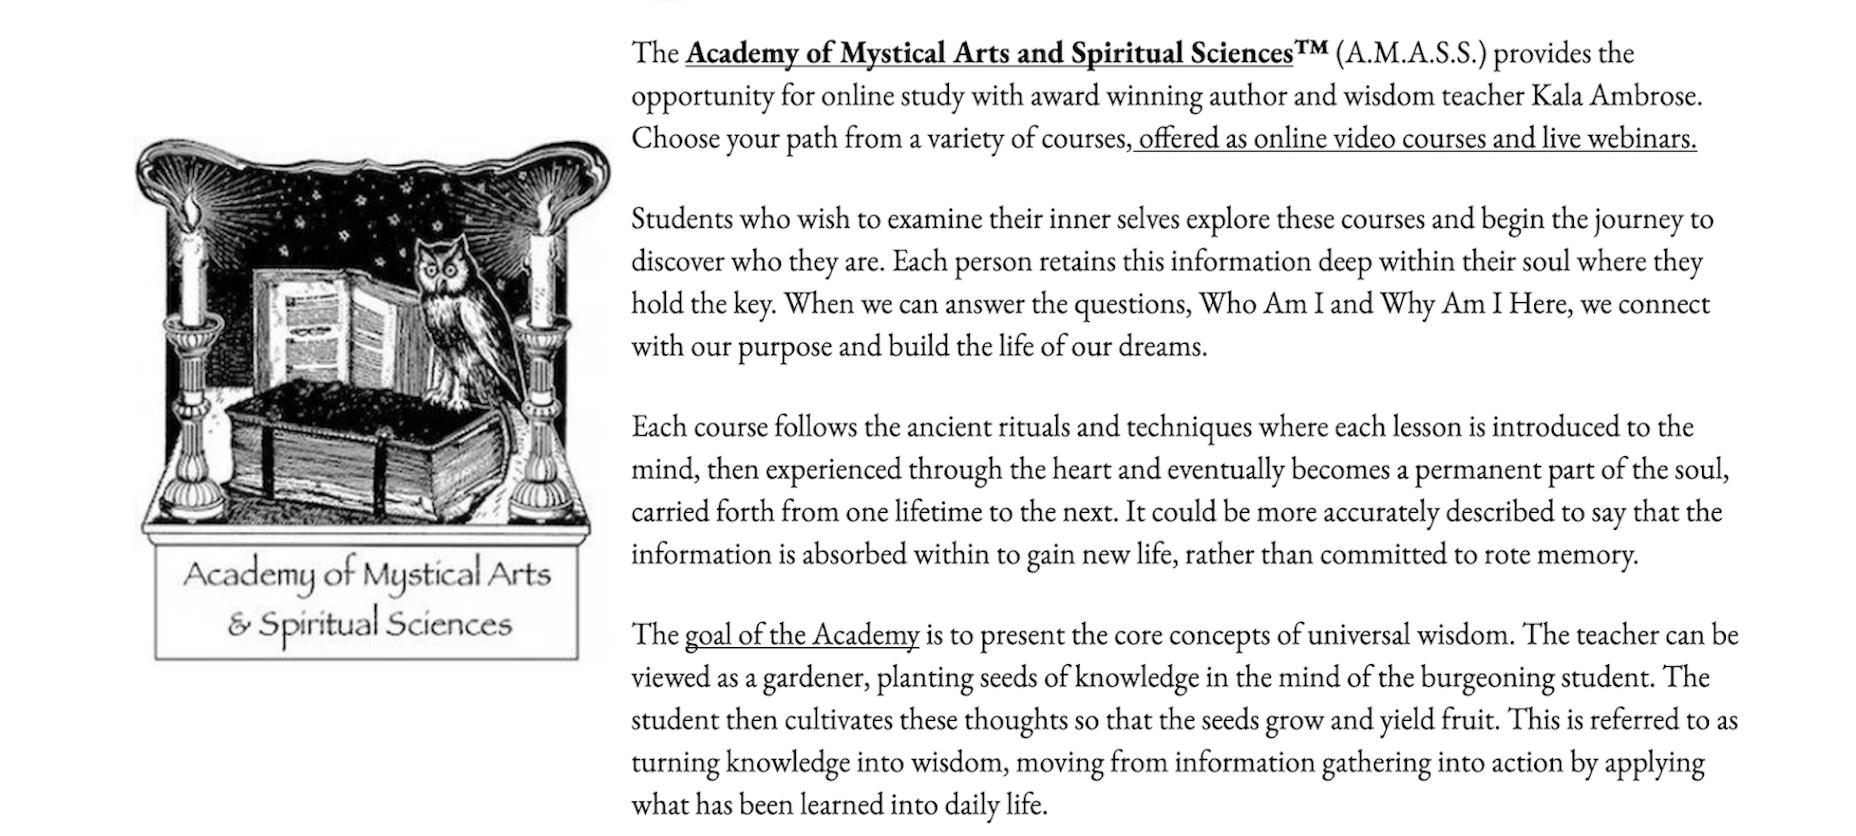 Academy of Mystical Arts and Spiritual Sciences